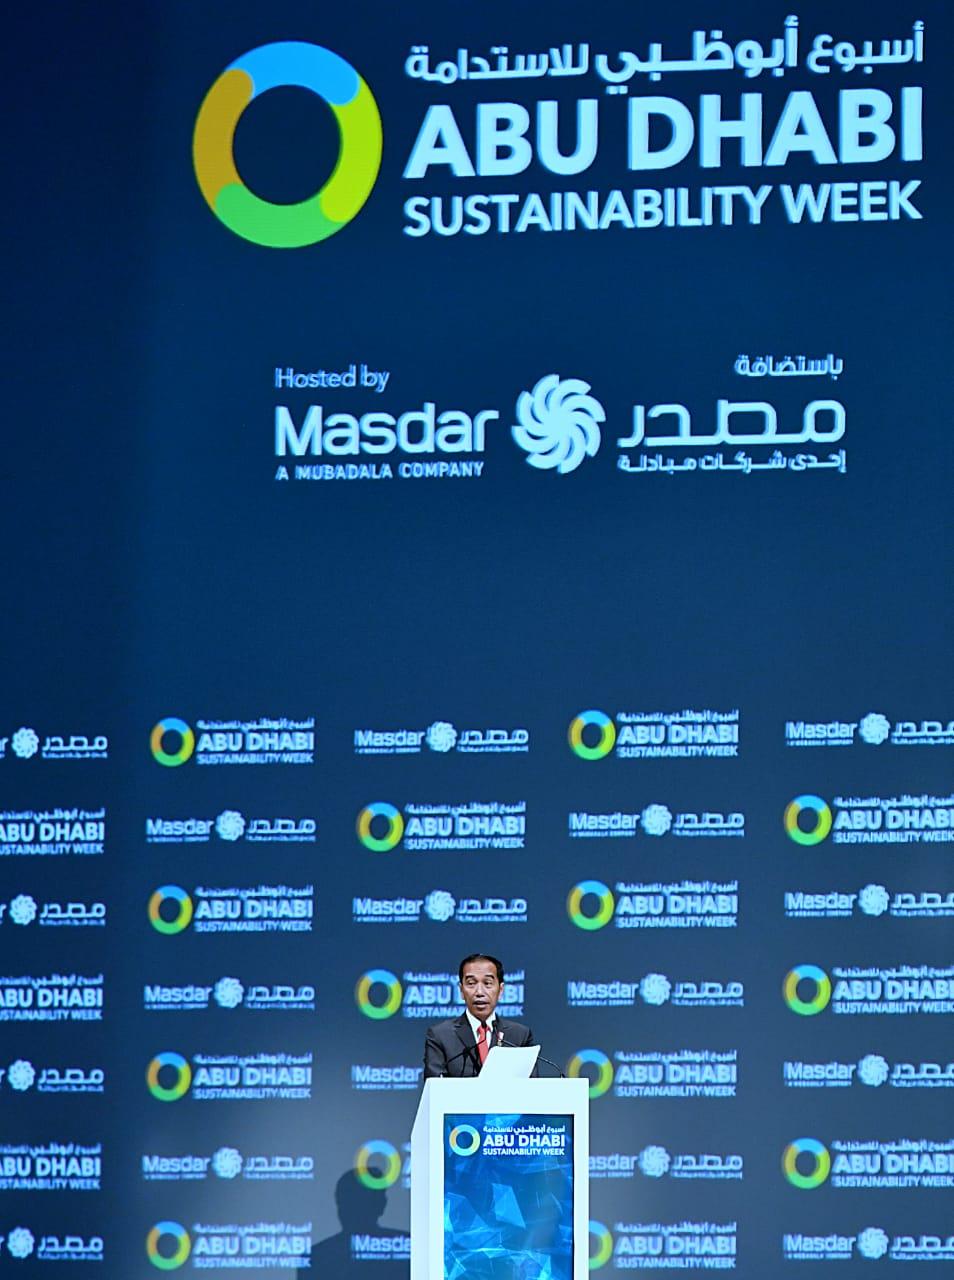 Presiden Undang Dunia untuk Berinvestasi di Ibu Kota Negara Baru yang Modern dan Ramah Lingkungan 114